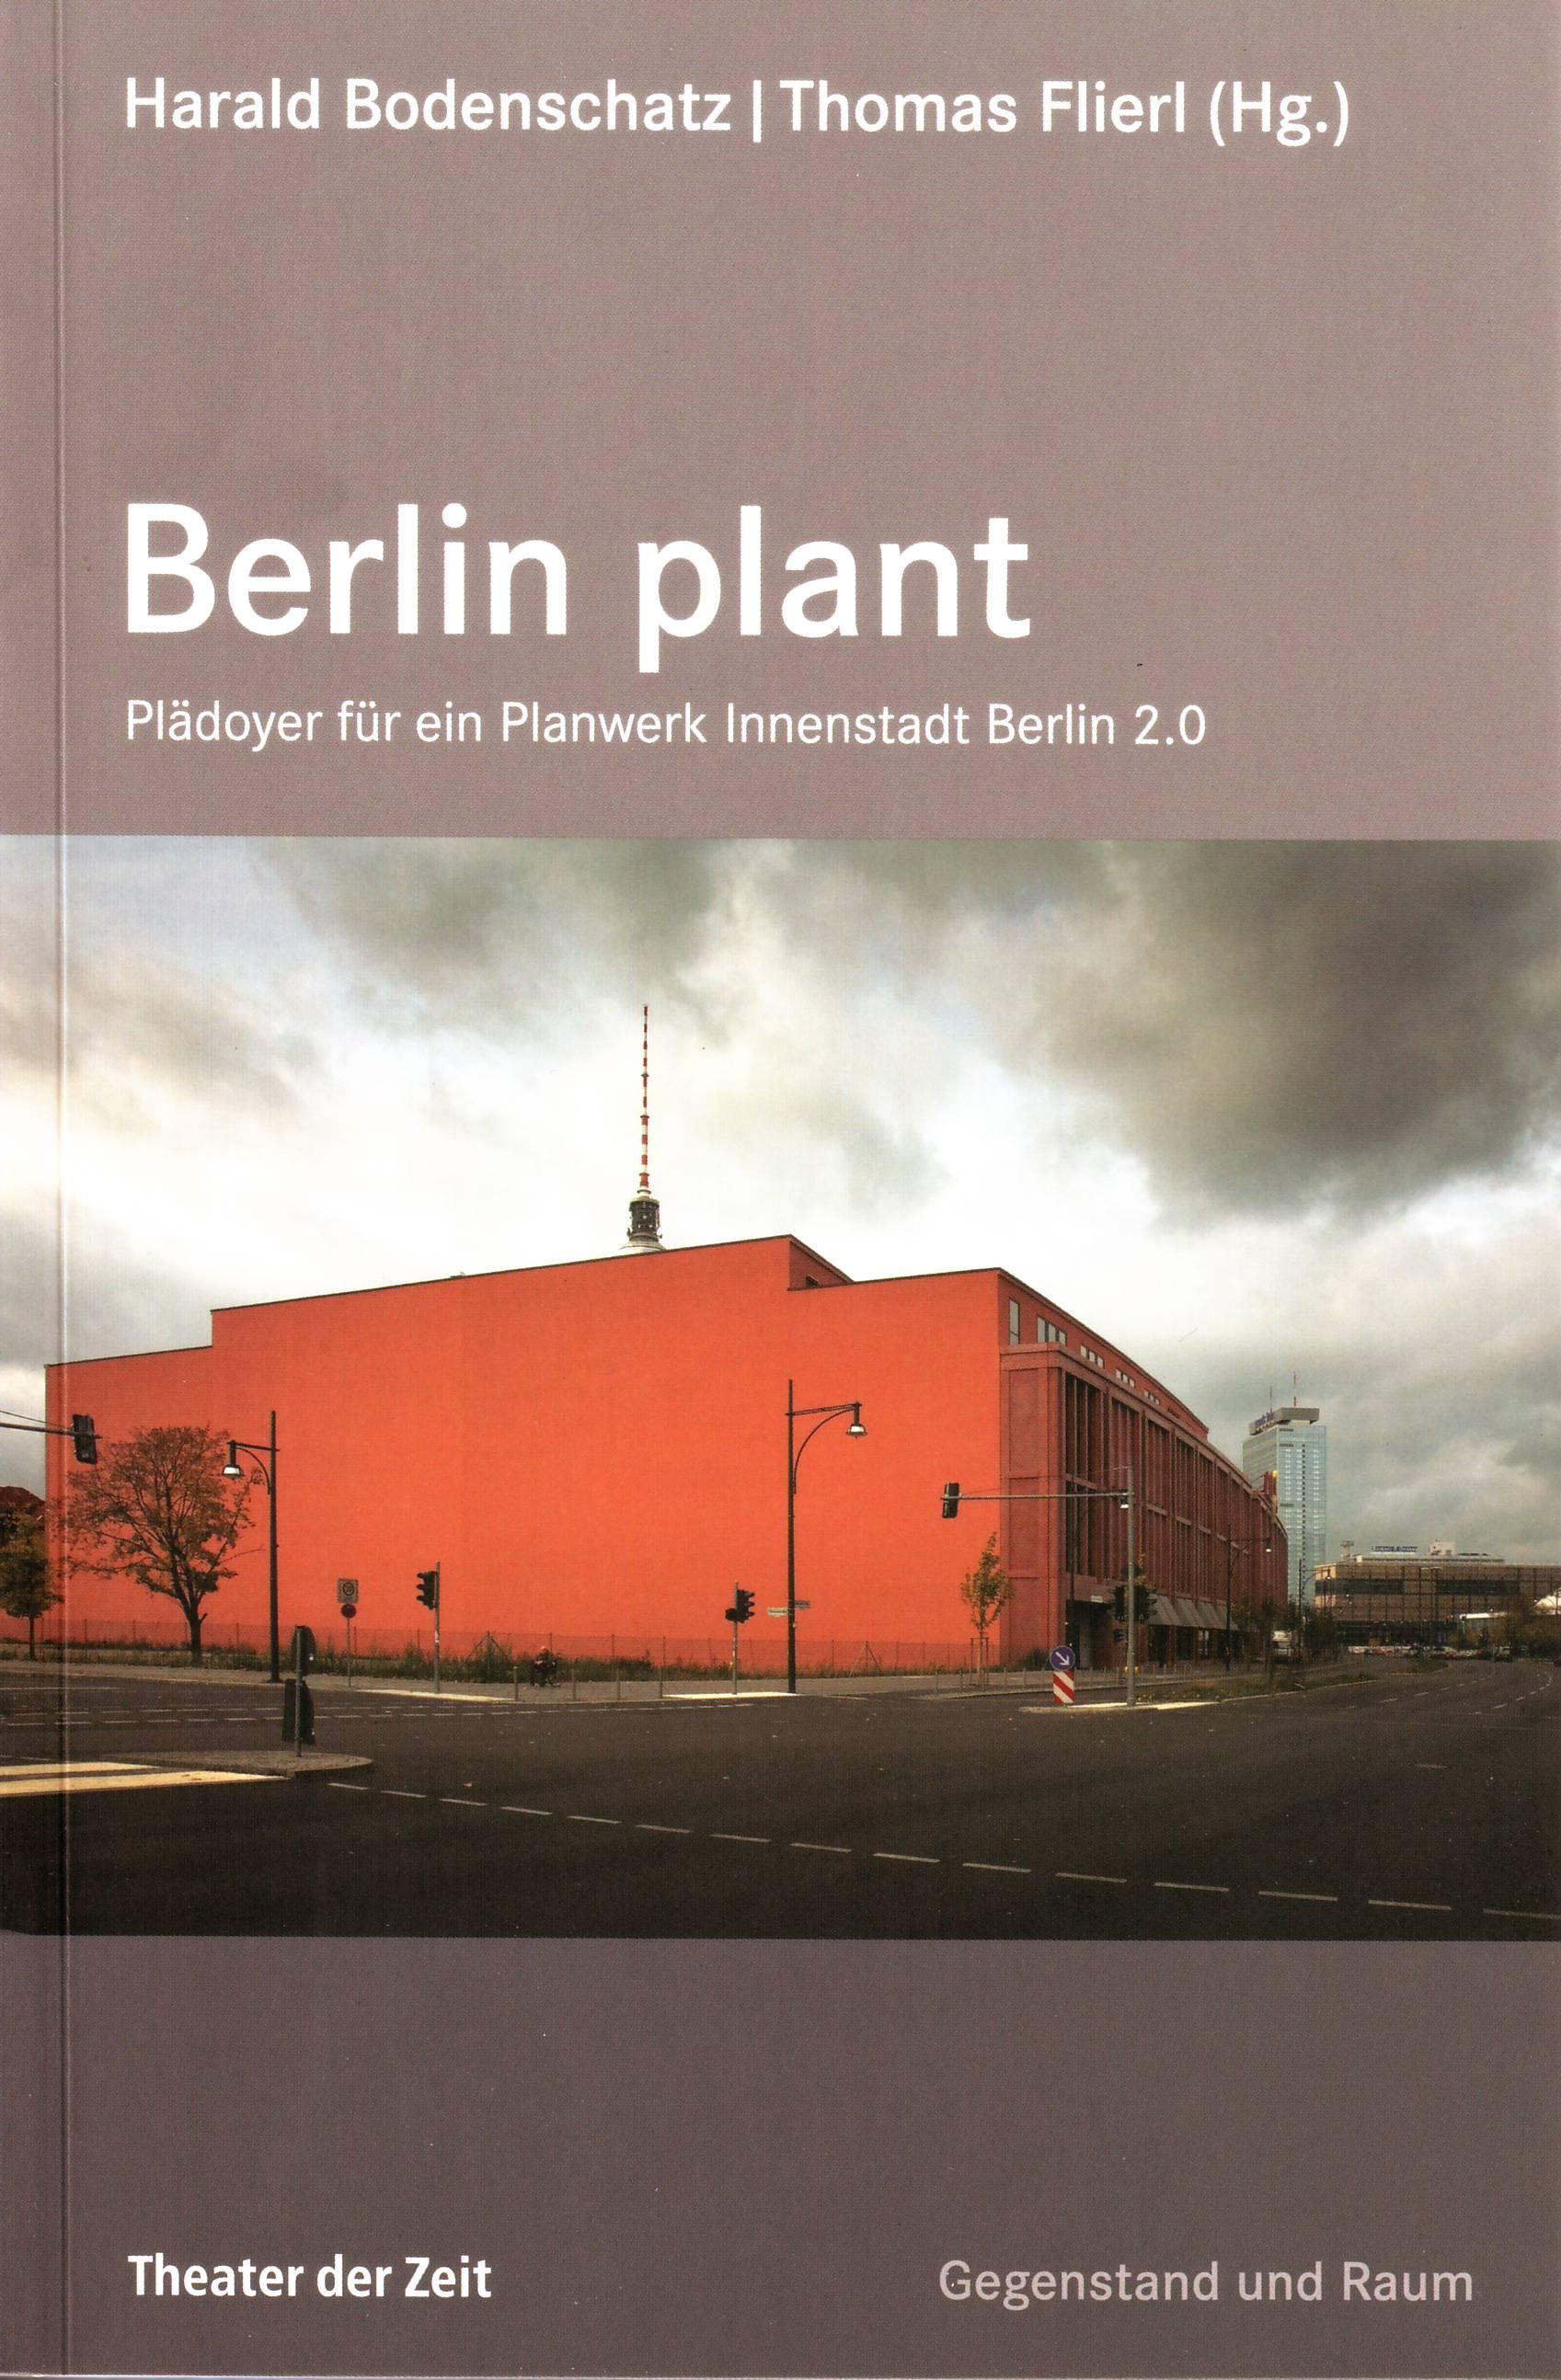 Berlin plant – endlich